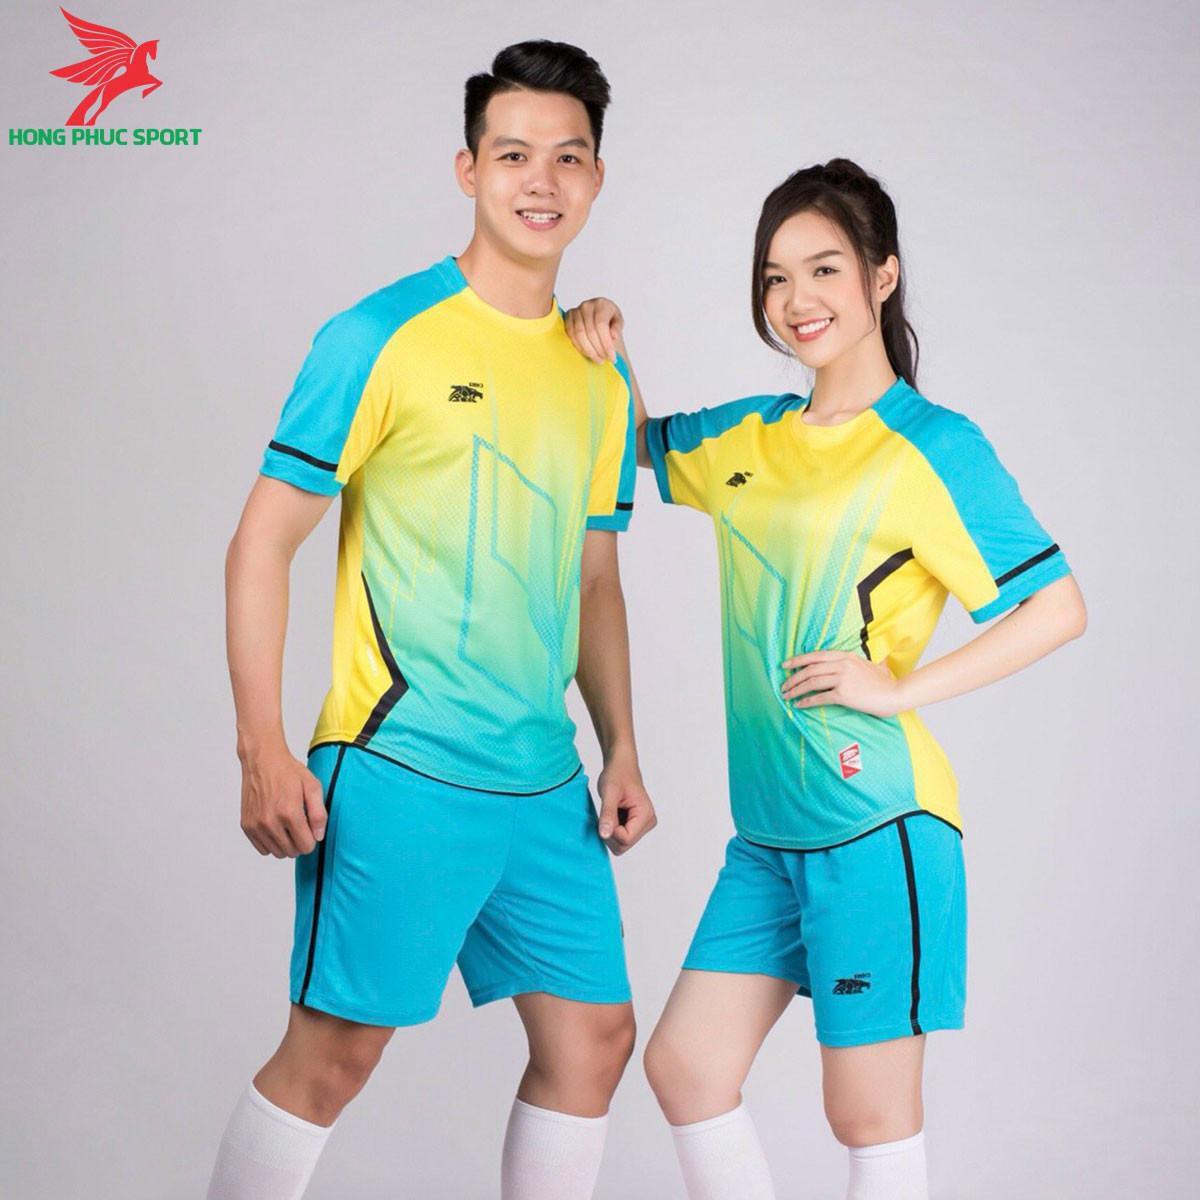 https://cdn.hongphucsport.com/unsafe/s4.shopbay.vn/files/285/ao-khong-logo-riki-airmaxx-mau-vang-603eefcb48f37.jpg